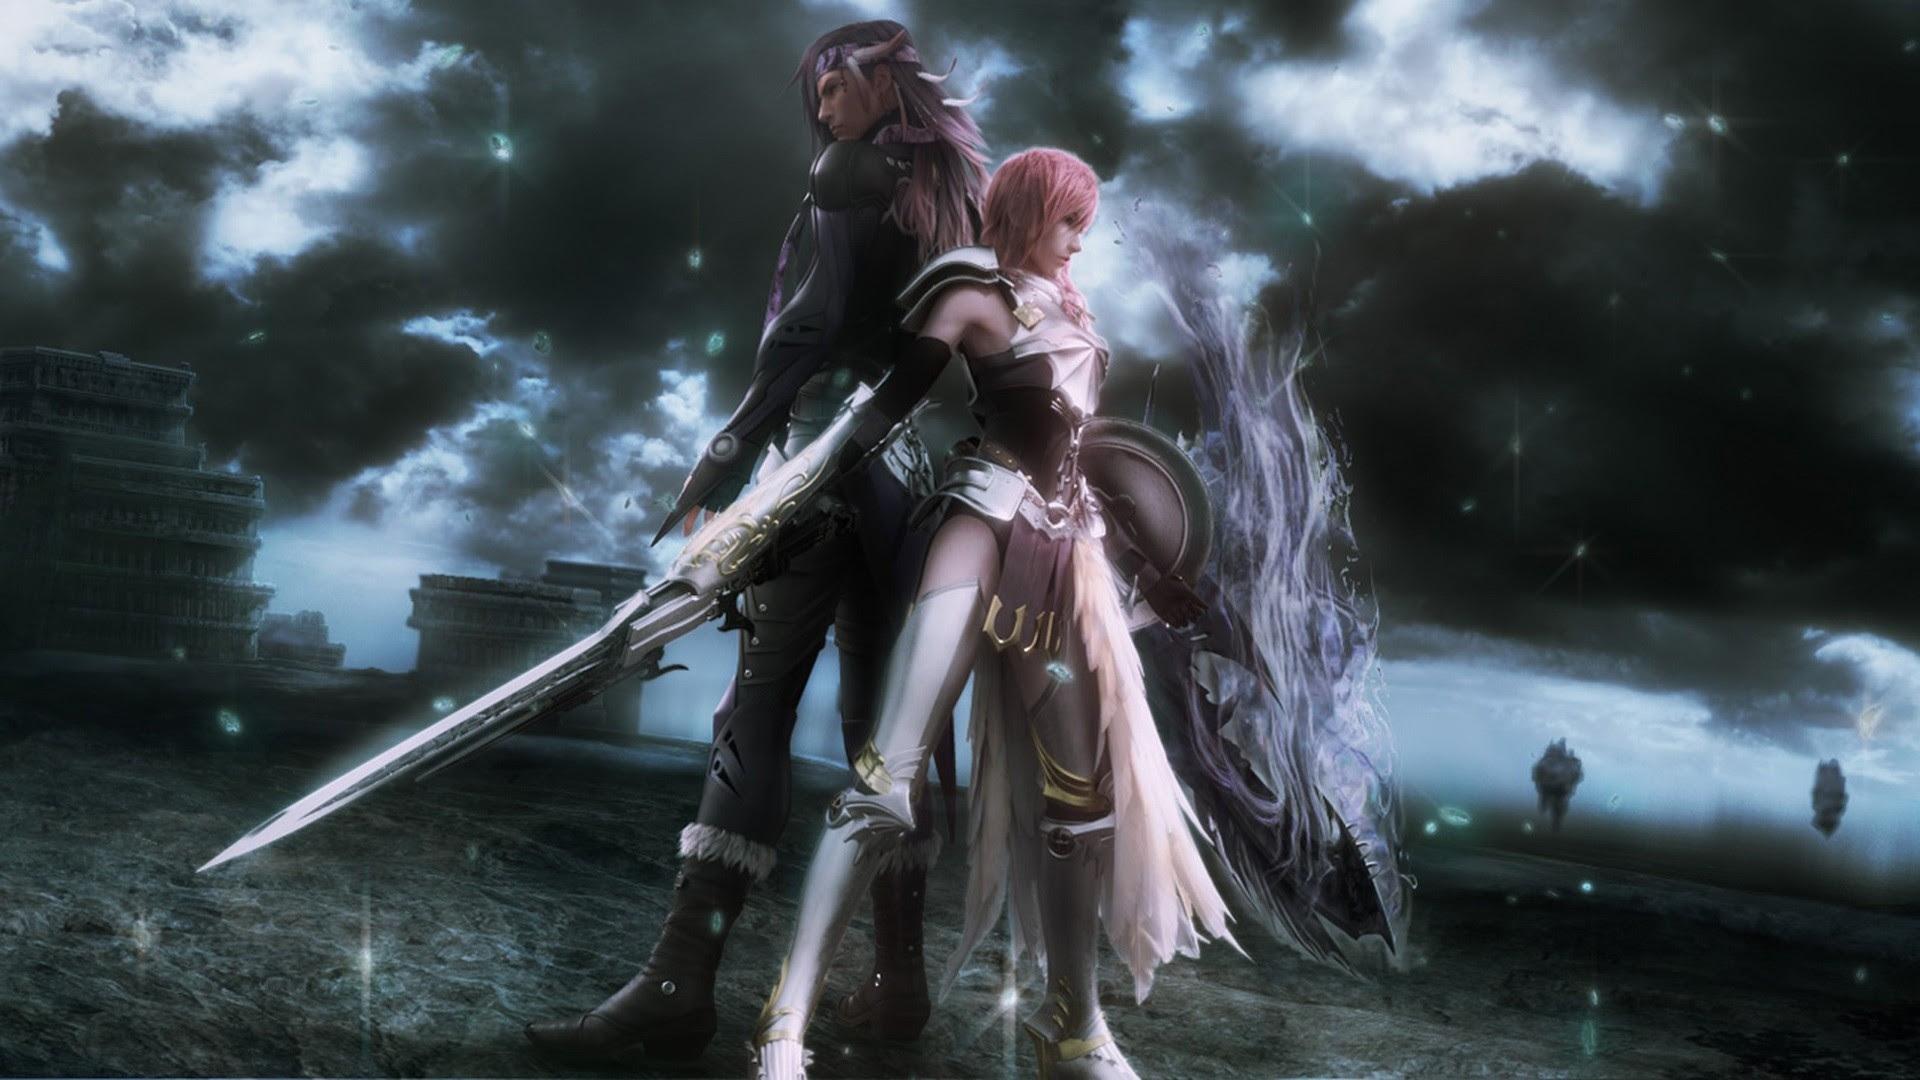 Download 990+ Final Fantasy Wallpaper Pretty HD Gratid